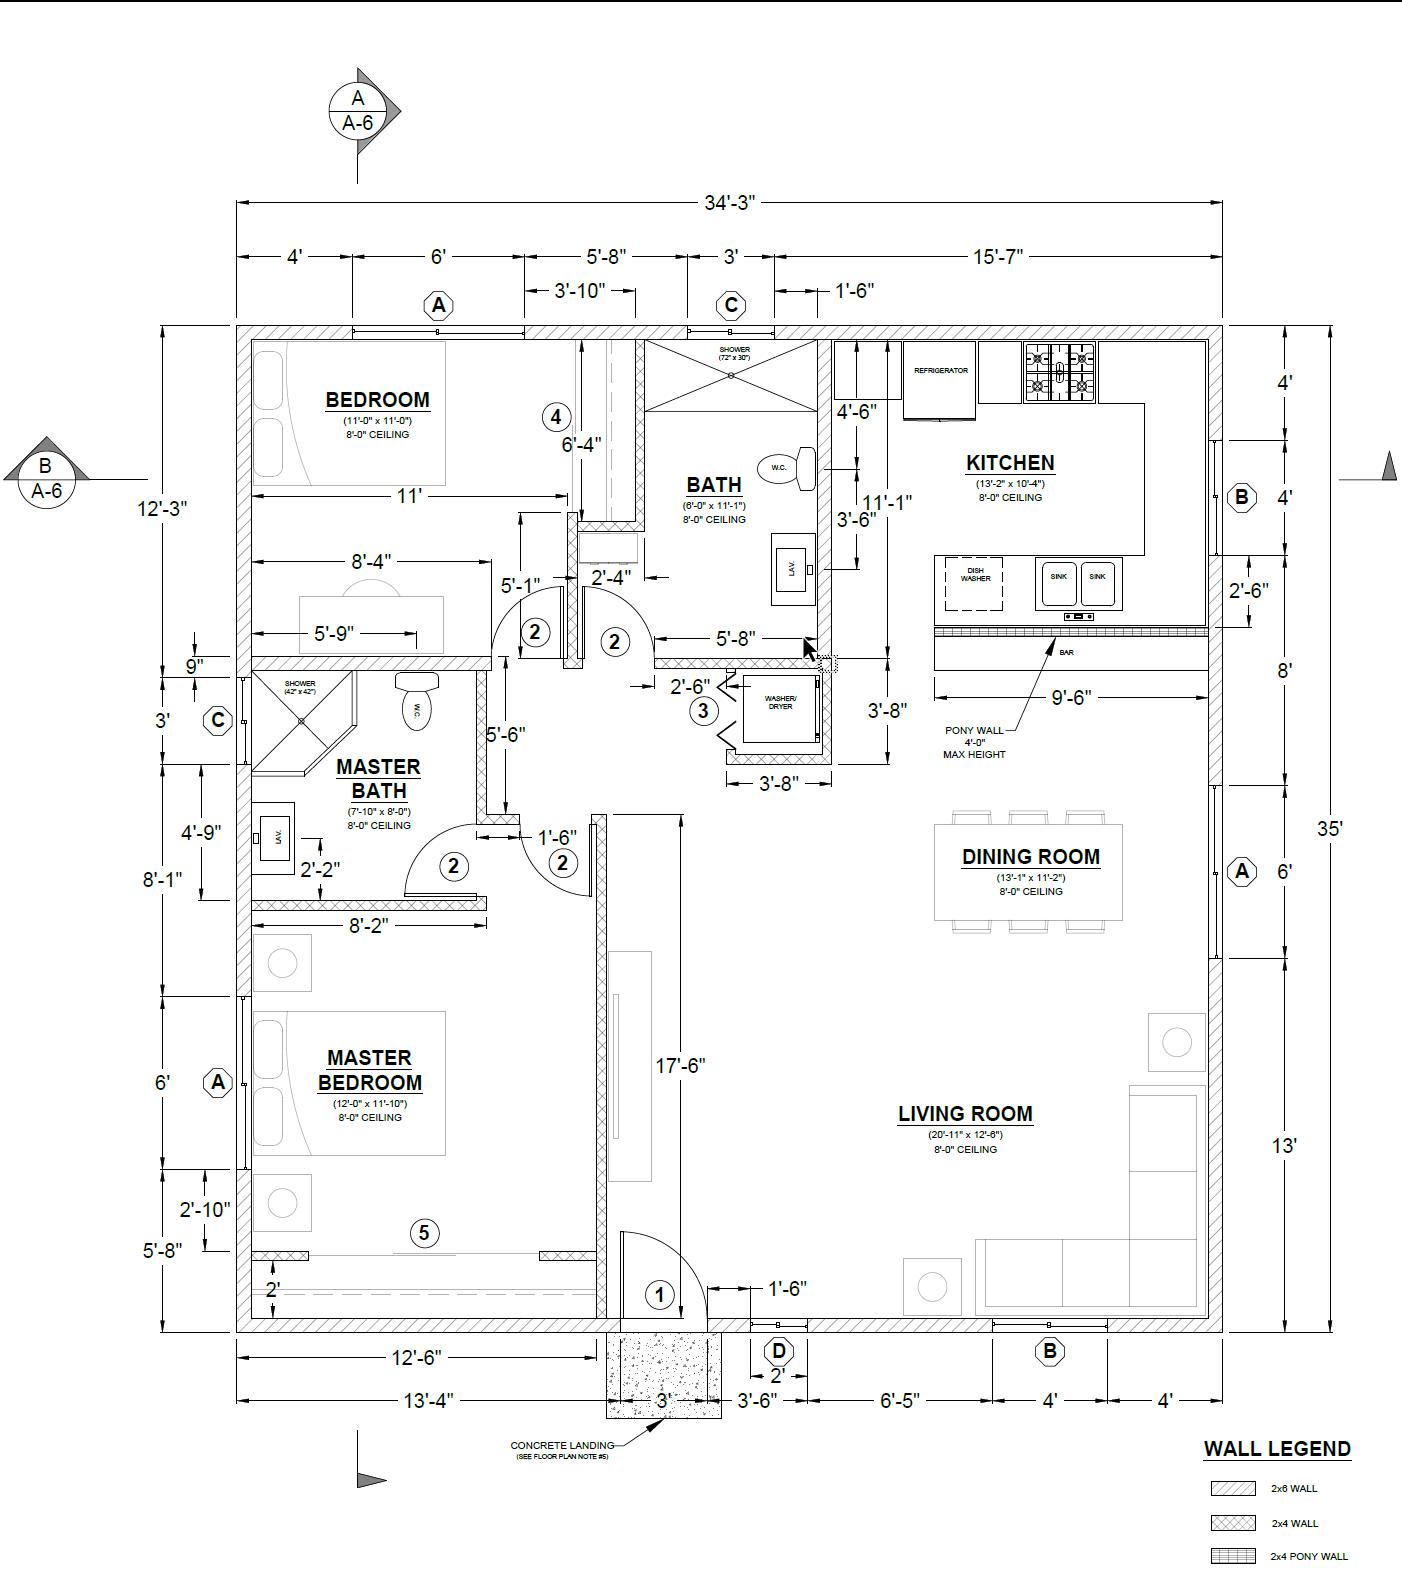 County-Standard-ADU-Plan-C-1200-2-bed